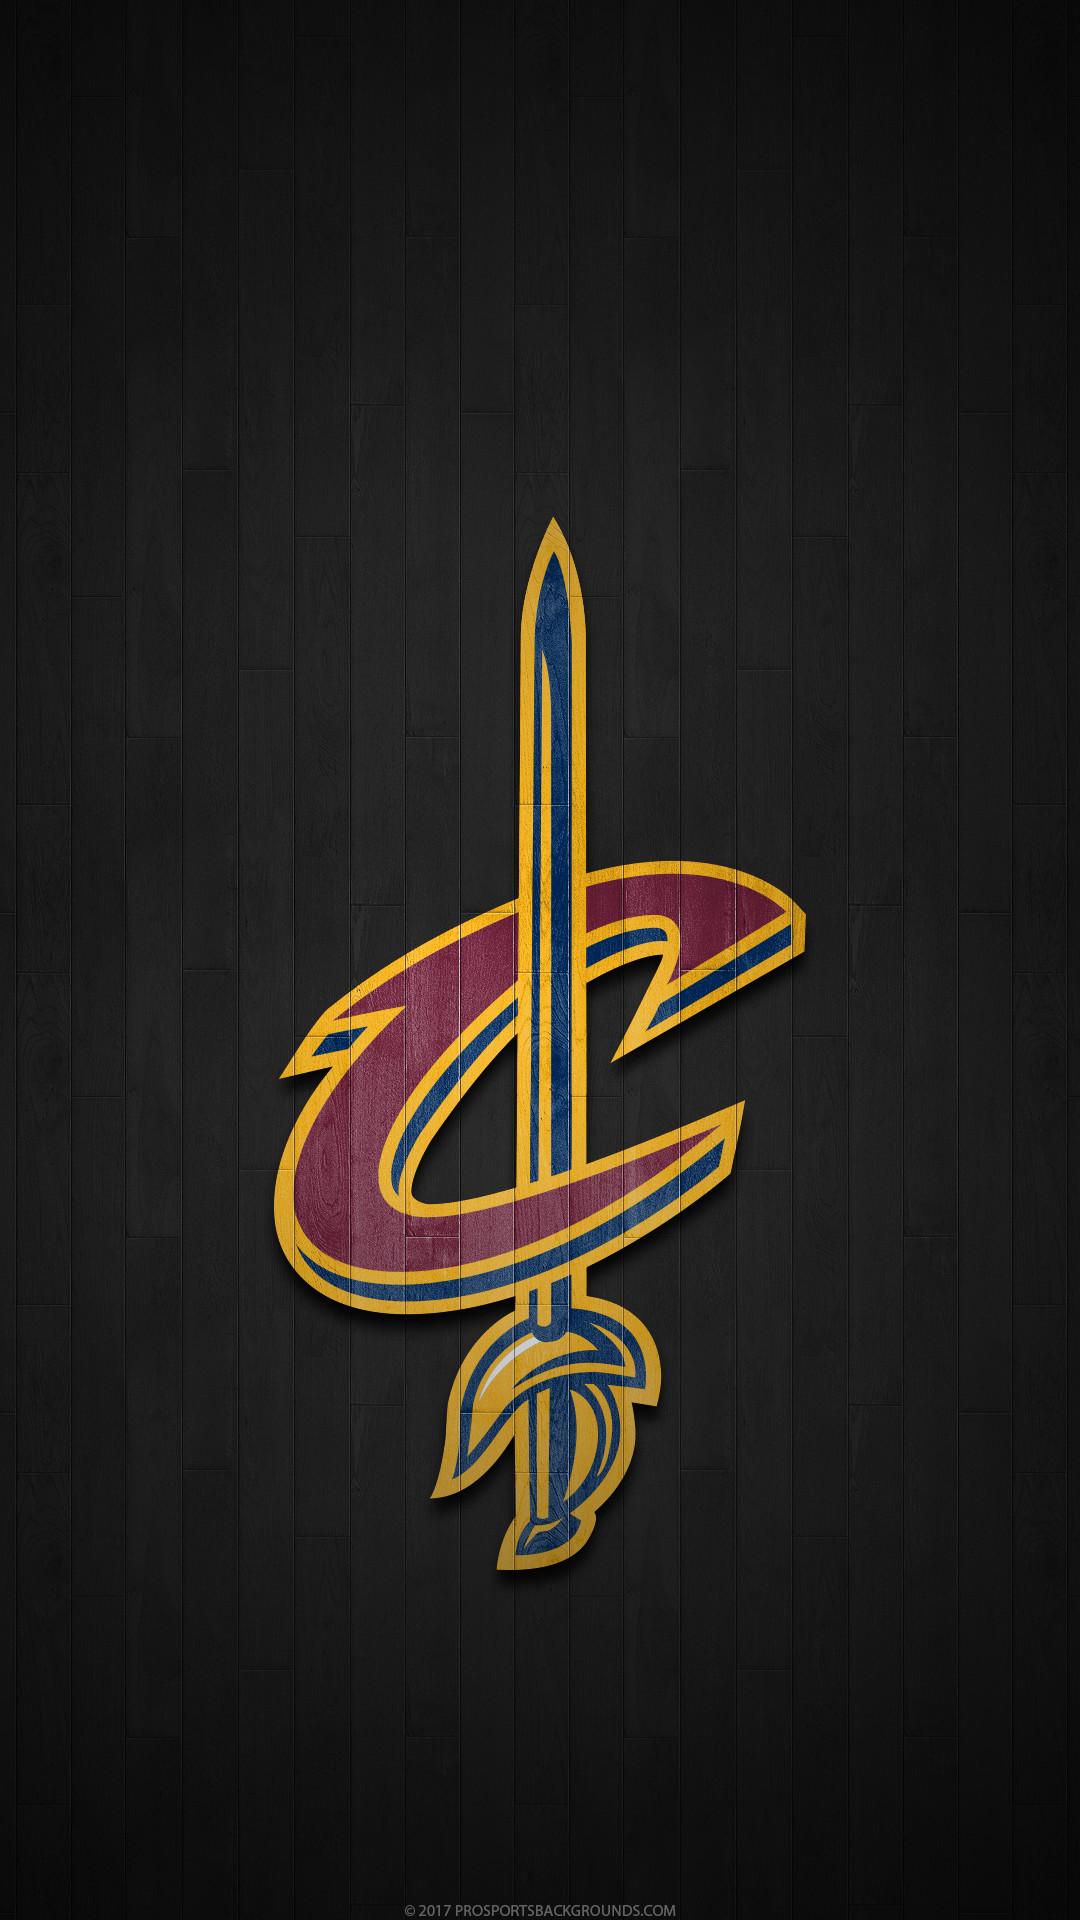 1080x1920 Cleveland Cavaliers 2017 Cavs Schedule Hardwood Nba Basketball Logo Wallpaper Free Iphone 5 6 Download